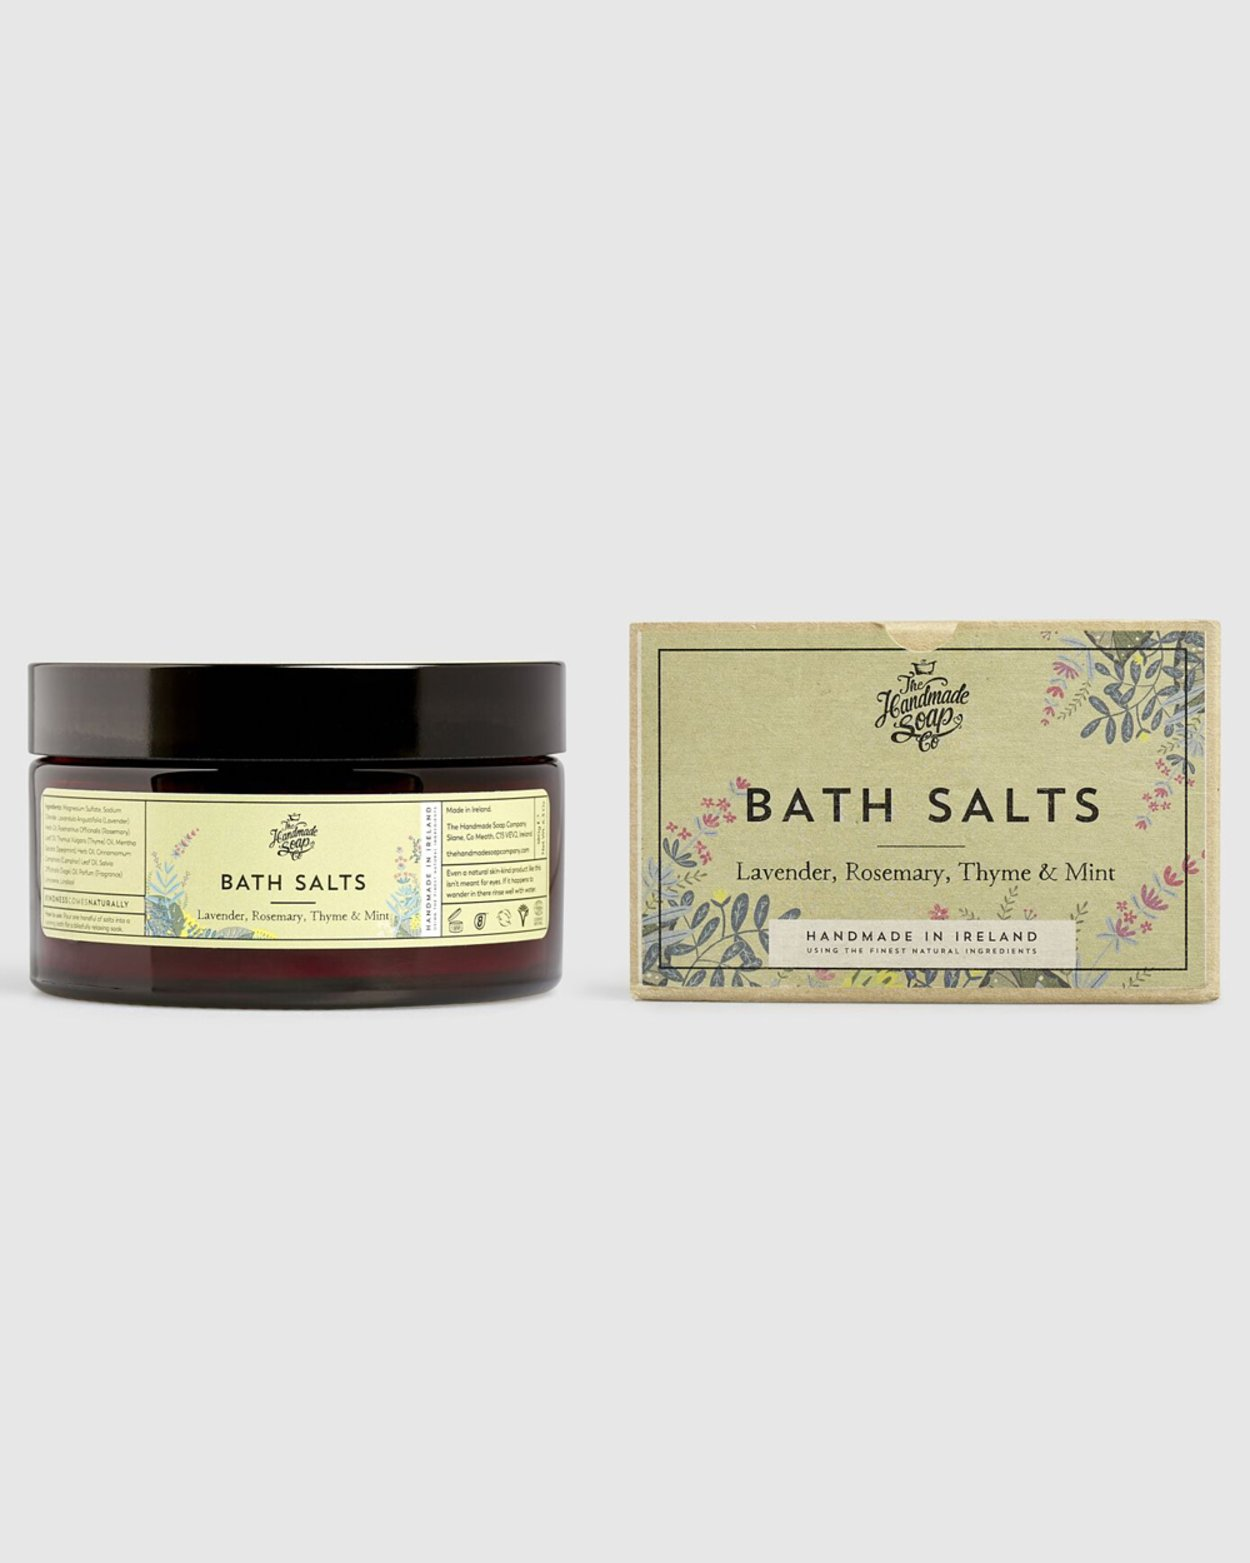 Lavender Rosemary Thyme & Mint Bath Salts